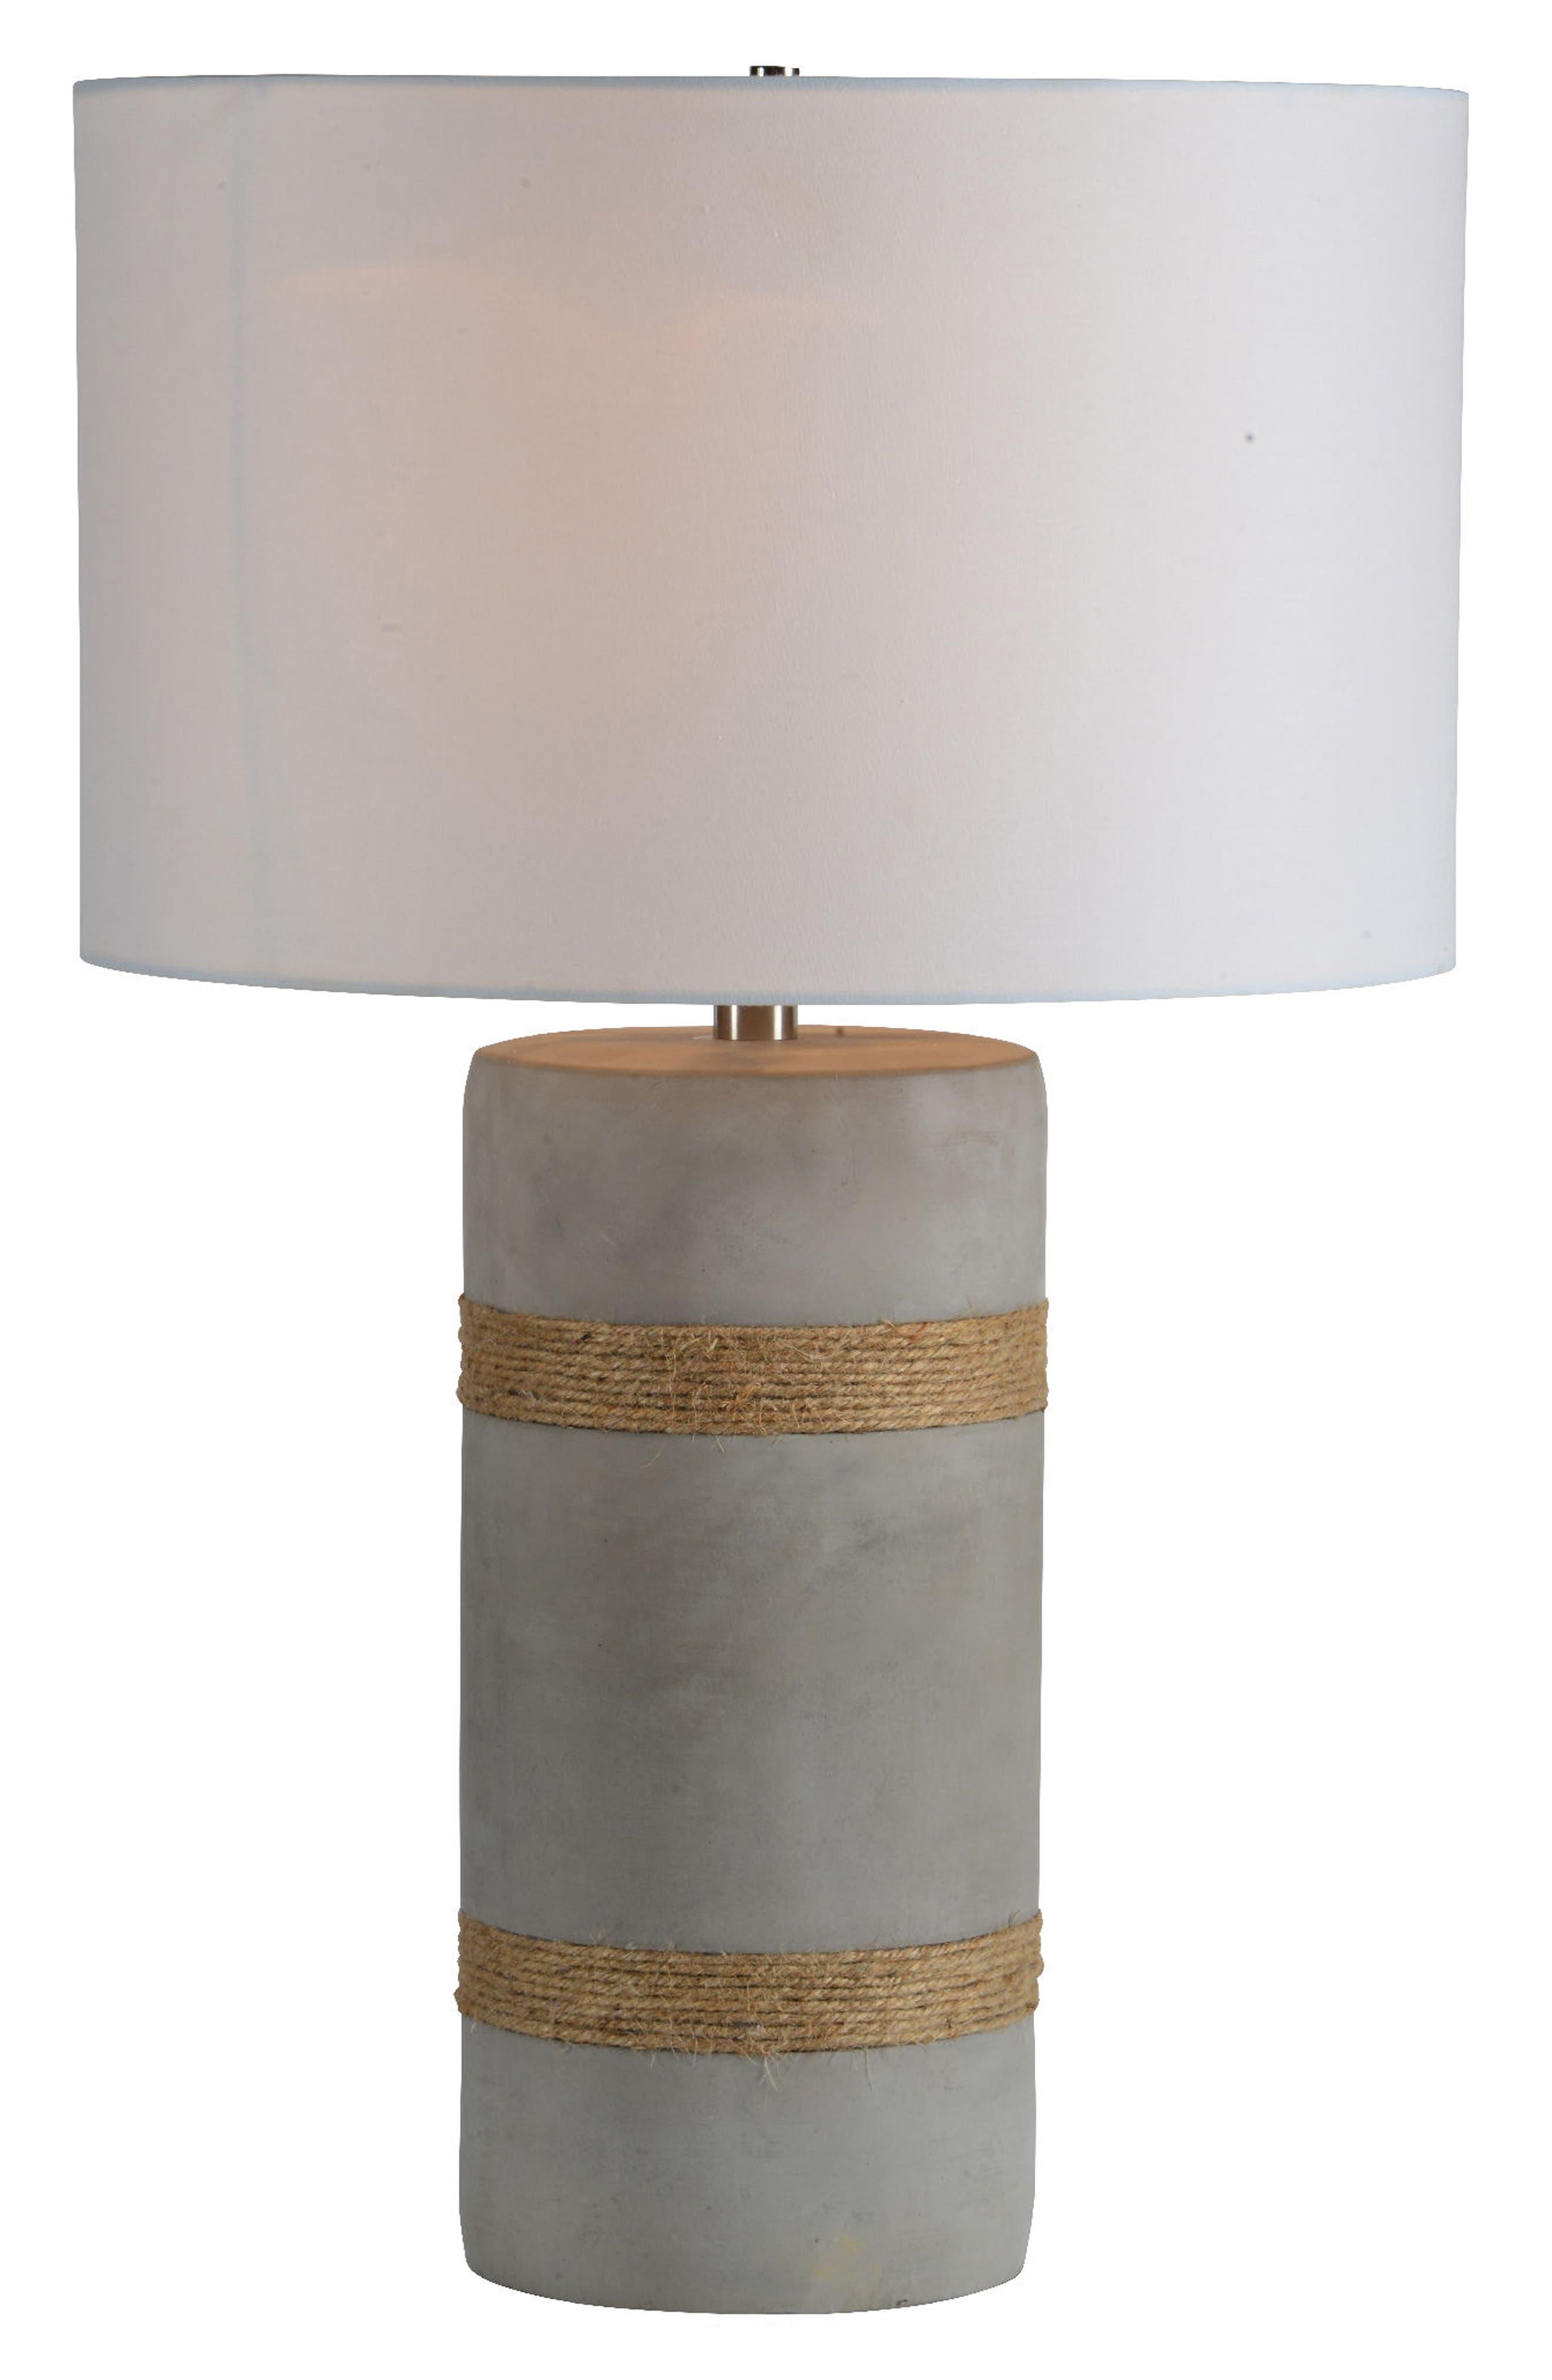 Malden Table Lamp,                         Main,                         color, ROPE DETAIL